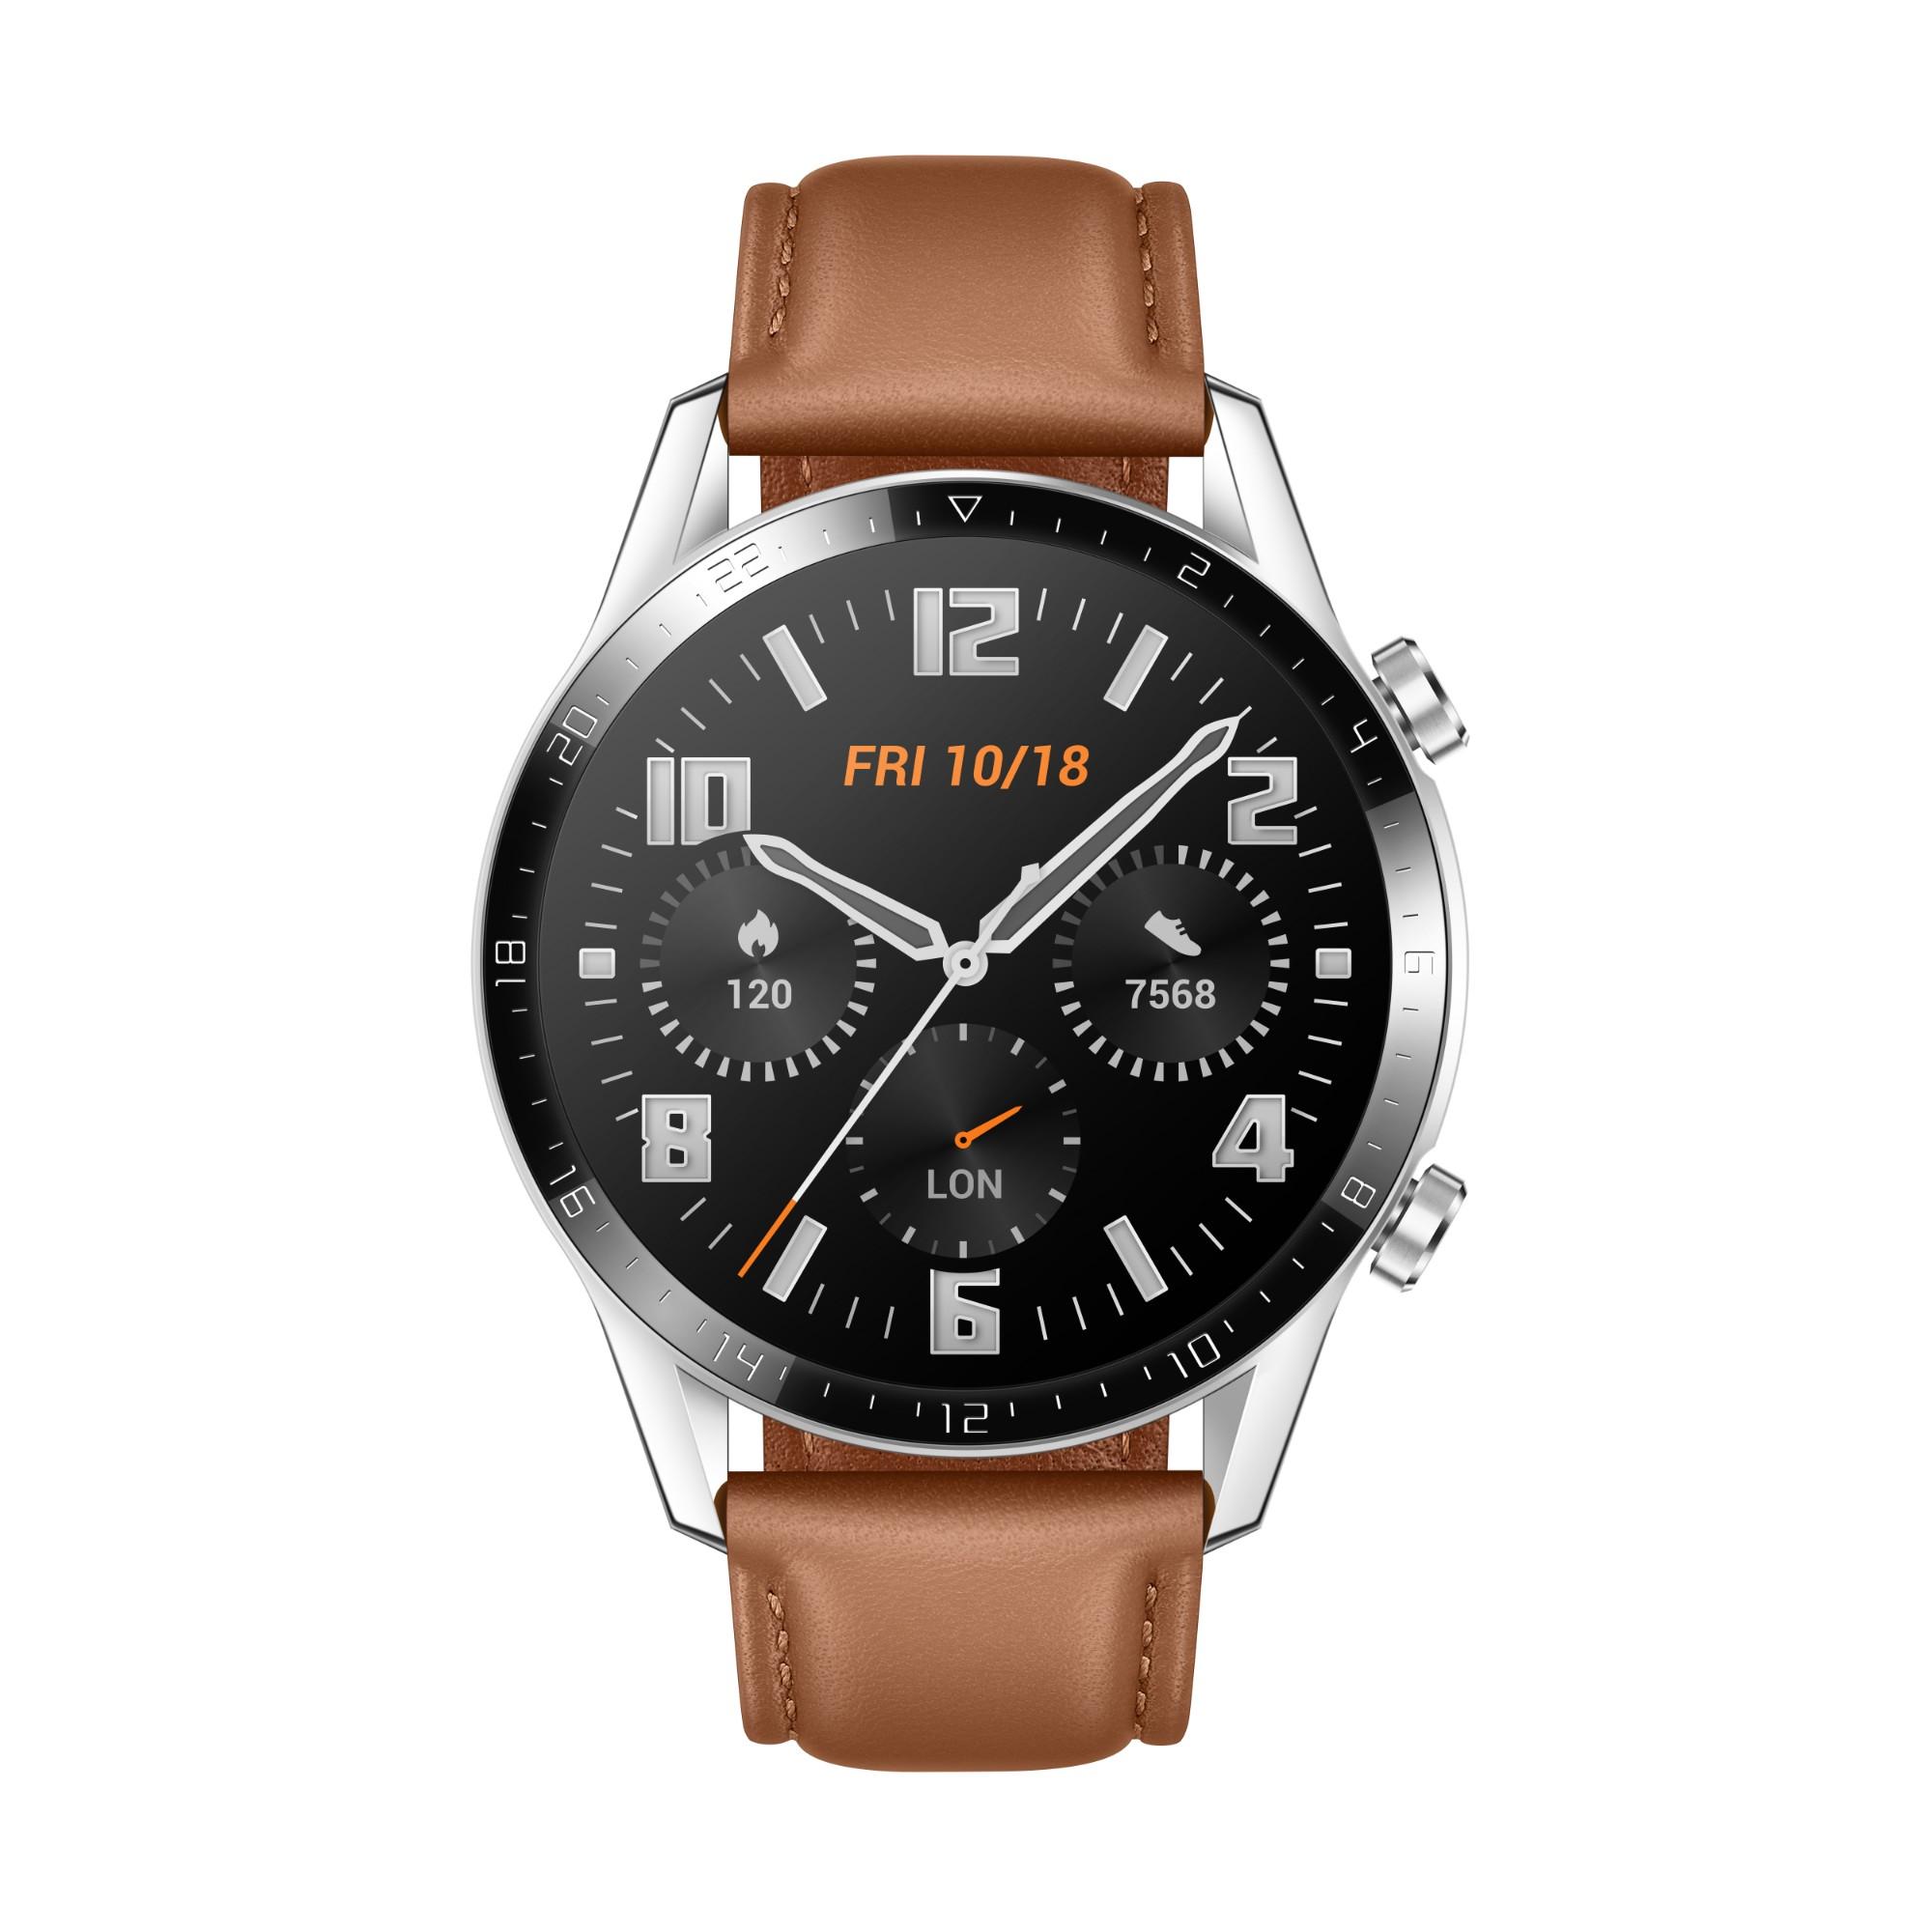 Huawei WATCH GT 2 smartwatch Stainless steel AMOLED 3.53 cm 1.39